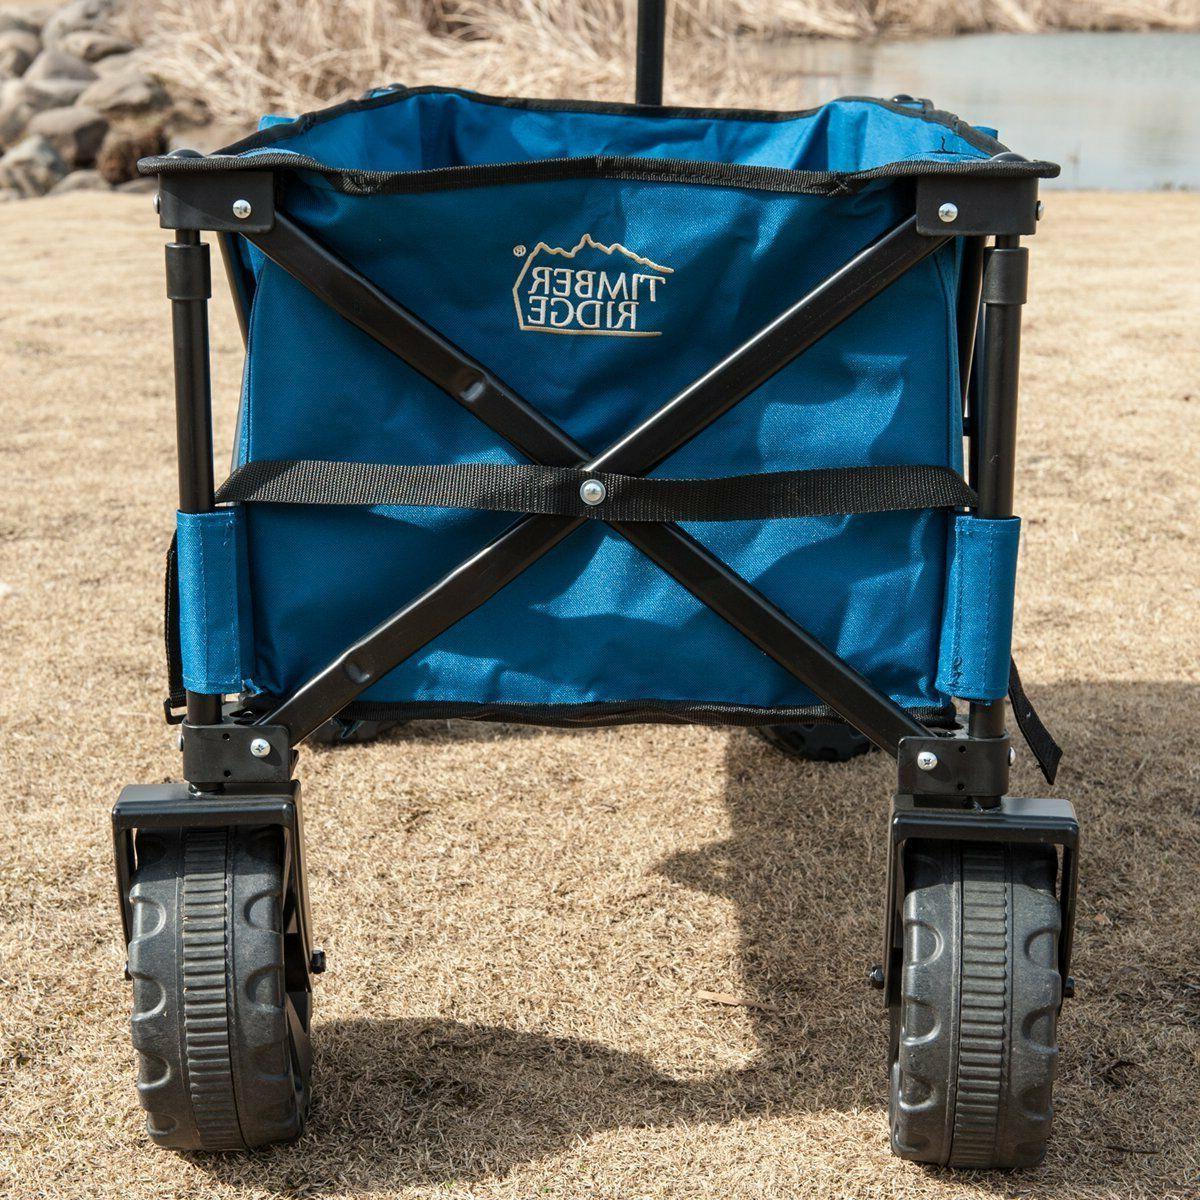 Folding Camping Sturdy Steel Shopping Wagon/Cart